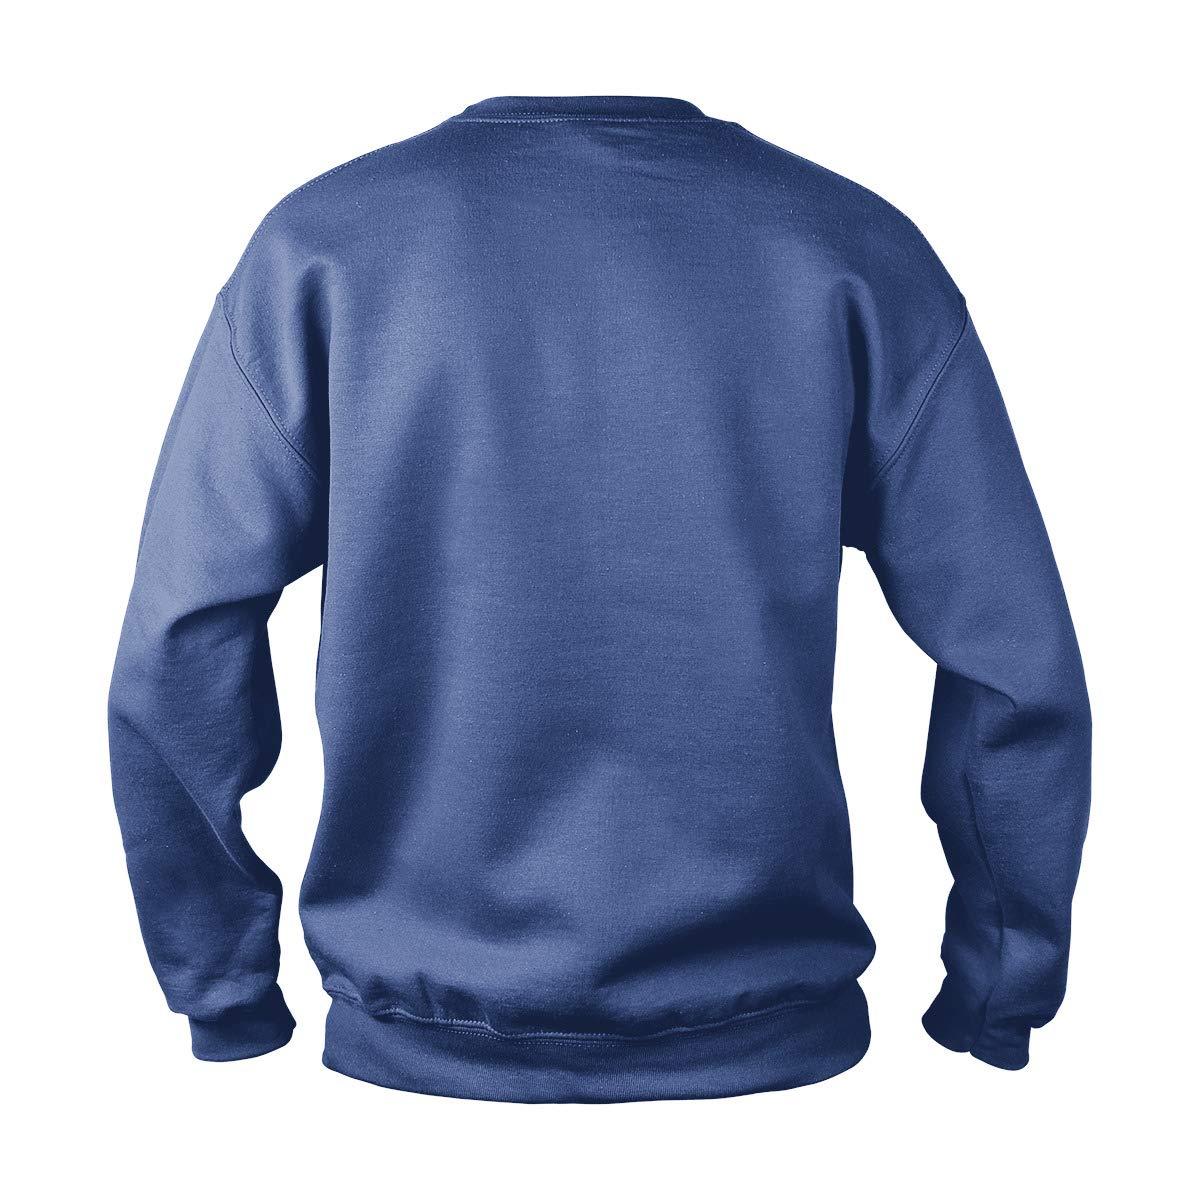 Sleeky Wonder Why Christmas Missed Us Big Adult Hooded Sweatshirt